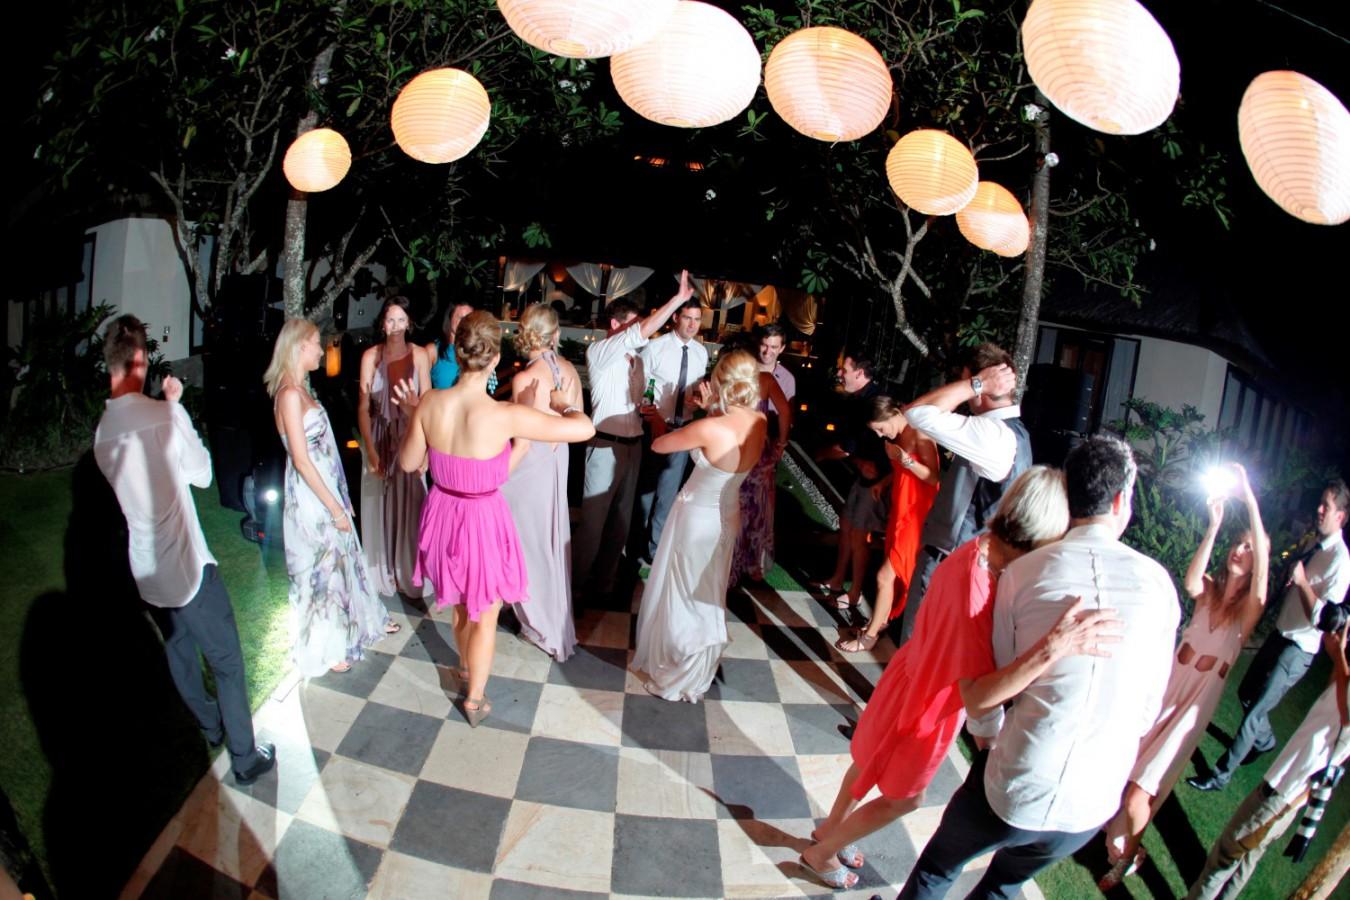 2011.10.16, Megann and Daniel, Ombak Luwung, MJY - Bali Wedding Paradise (39)